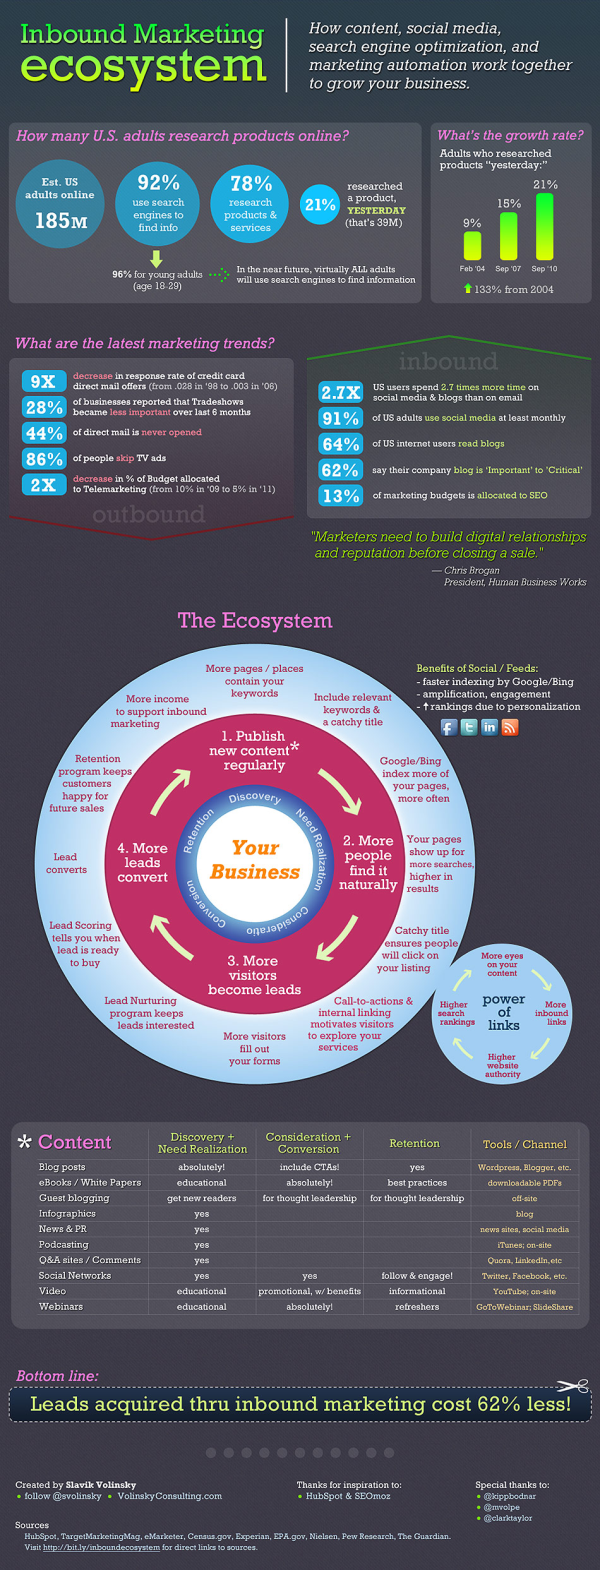 Inbound Marketing Ecosystem resized 600